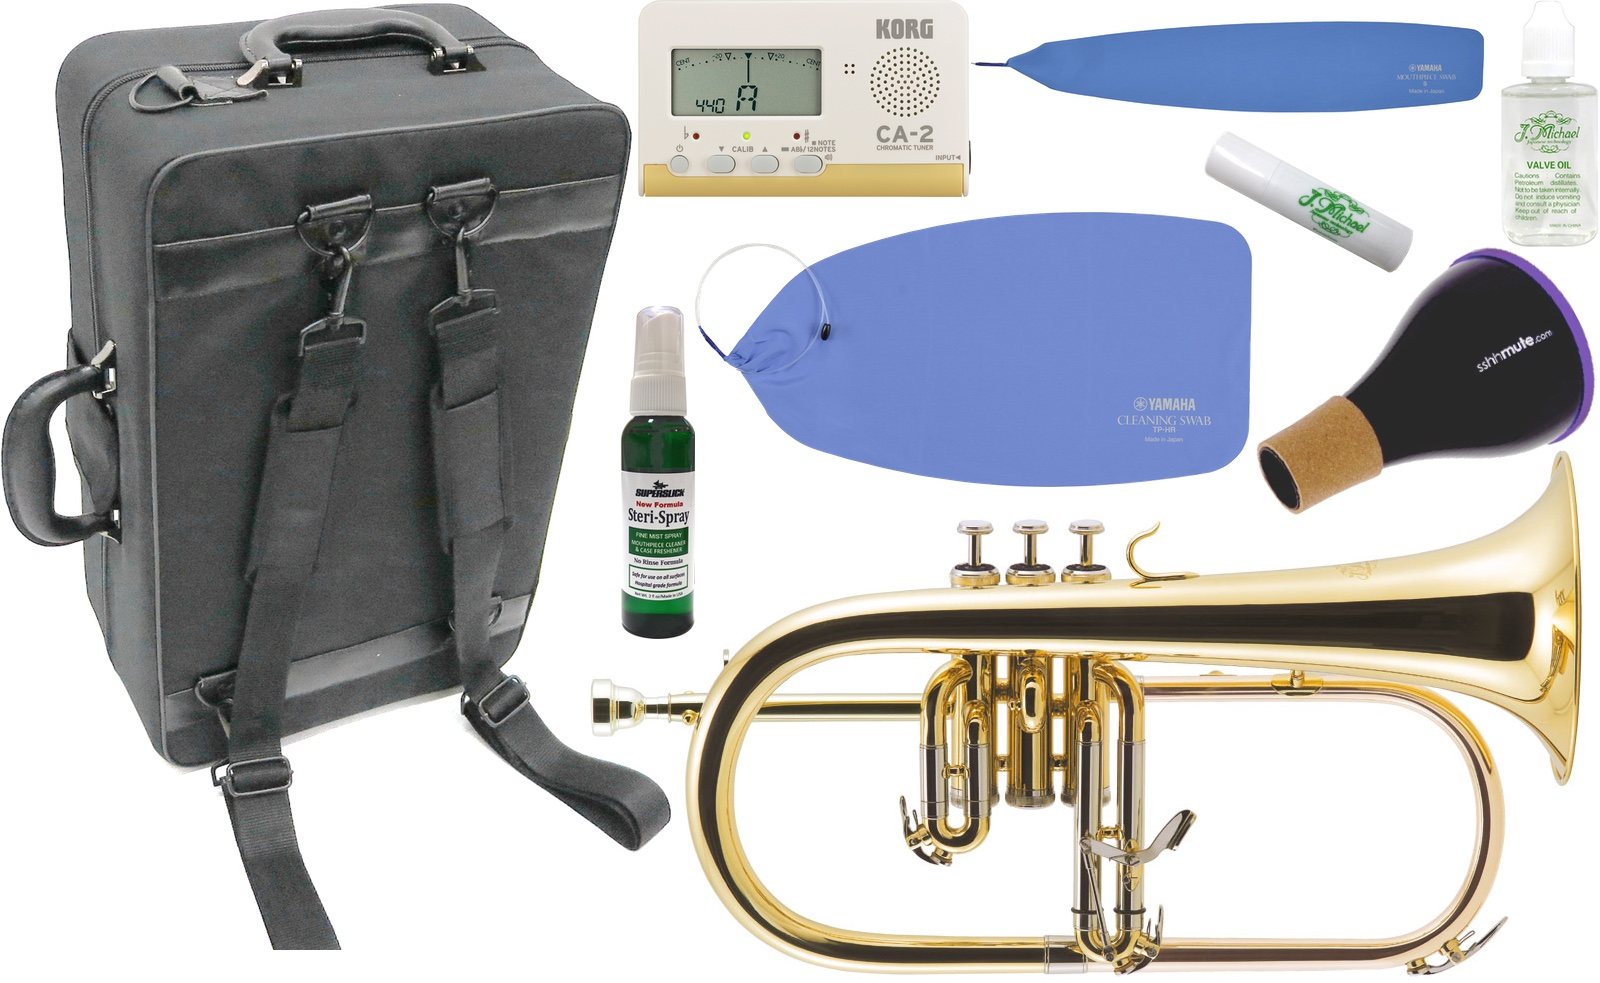 J Michael ( Jマイケル ) FG-500 フリューゲルホルン 新品 ゴールド 管楽器 B· 本体 Flugelhorn ミュート セット E 北海道 沖縄 離島 同梱不可